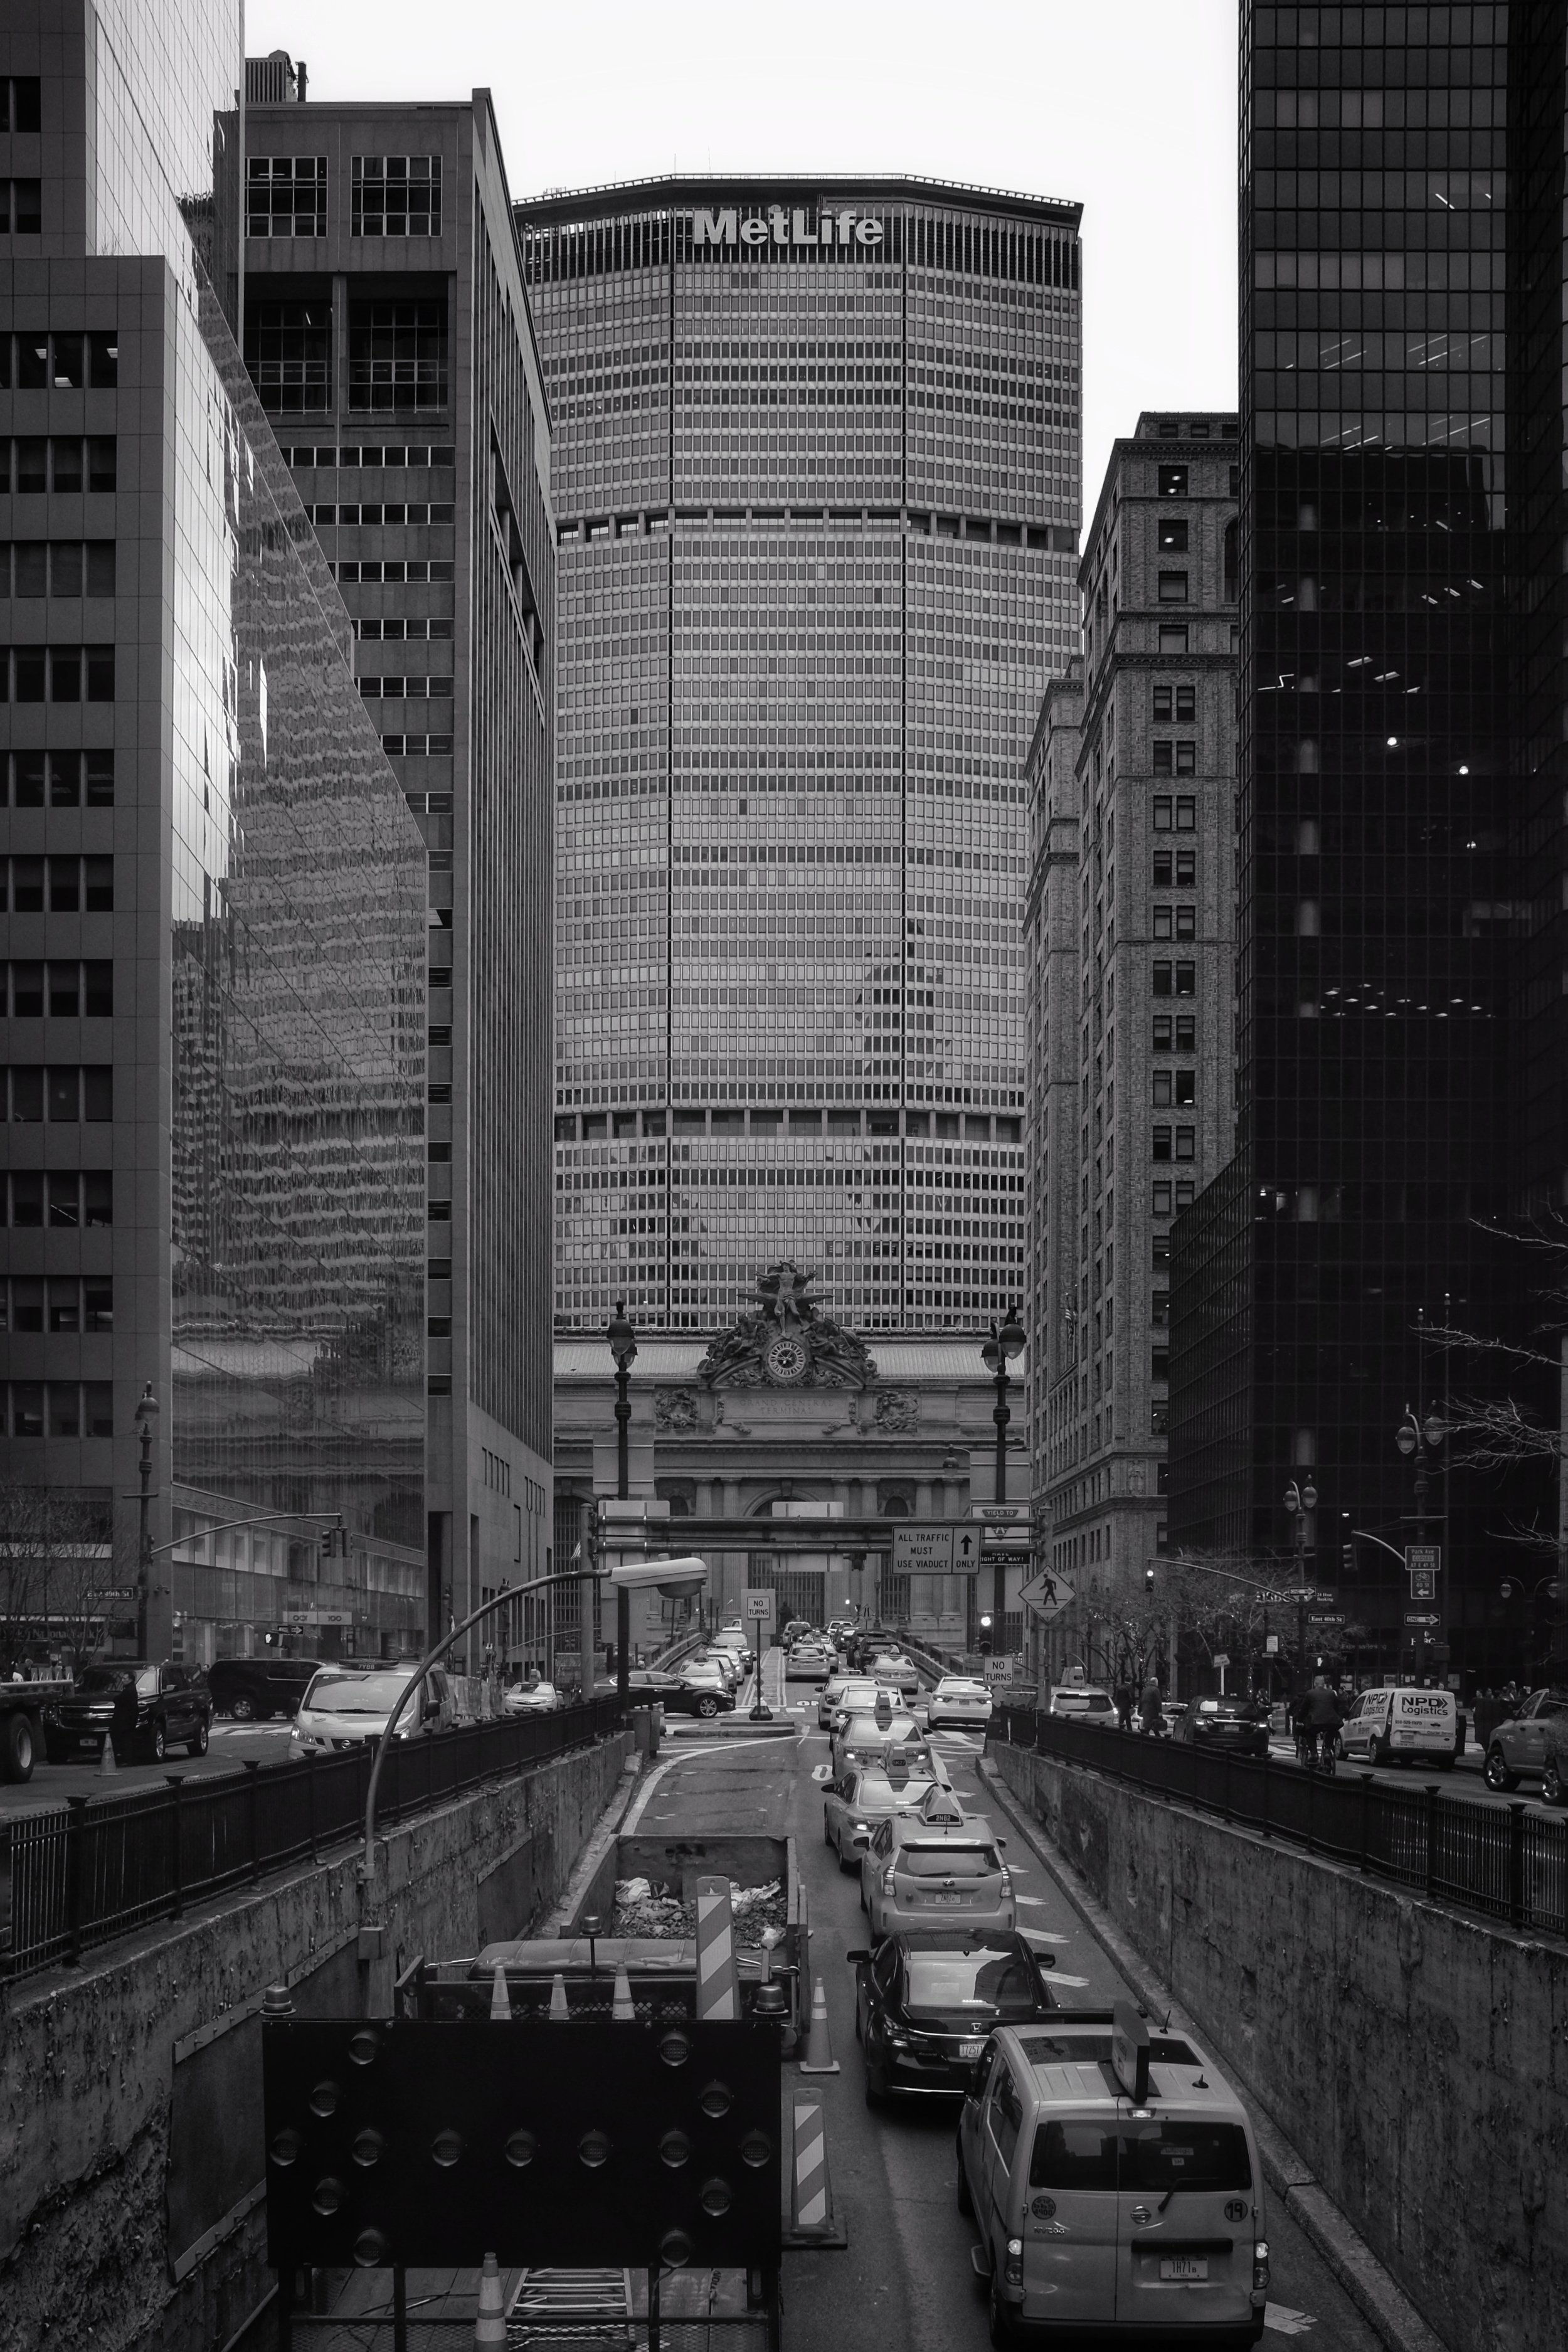 Grand Central Terminal. Met Life Building. Park Avenue. New York City. 2017.